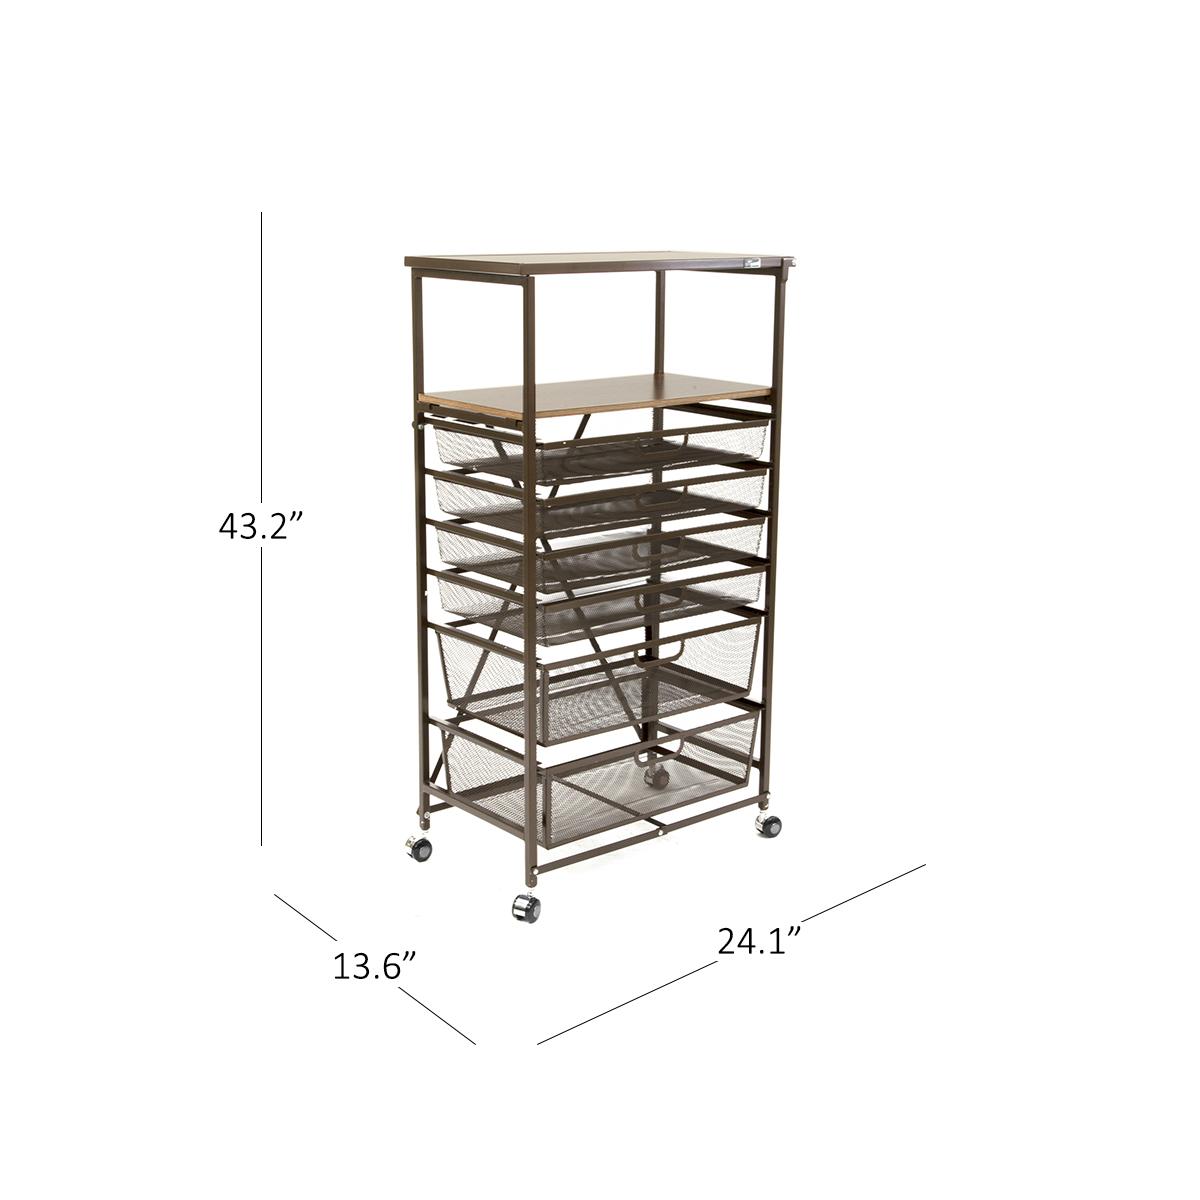 6 Drawer Craft Cart | Origami Rack - photo#30